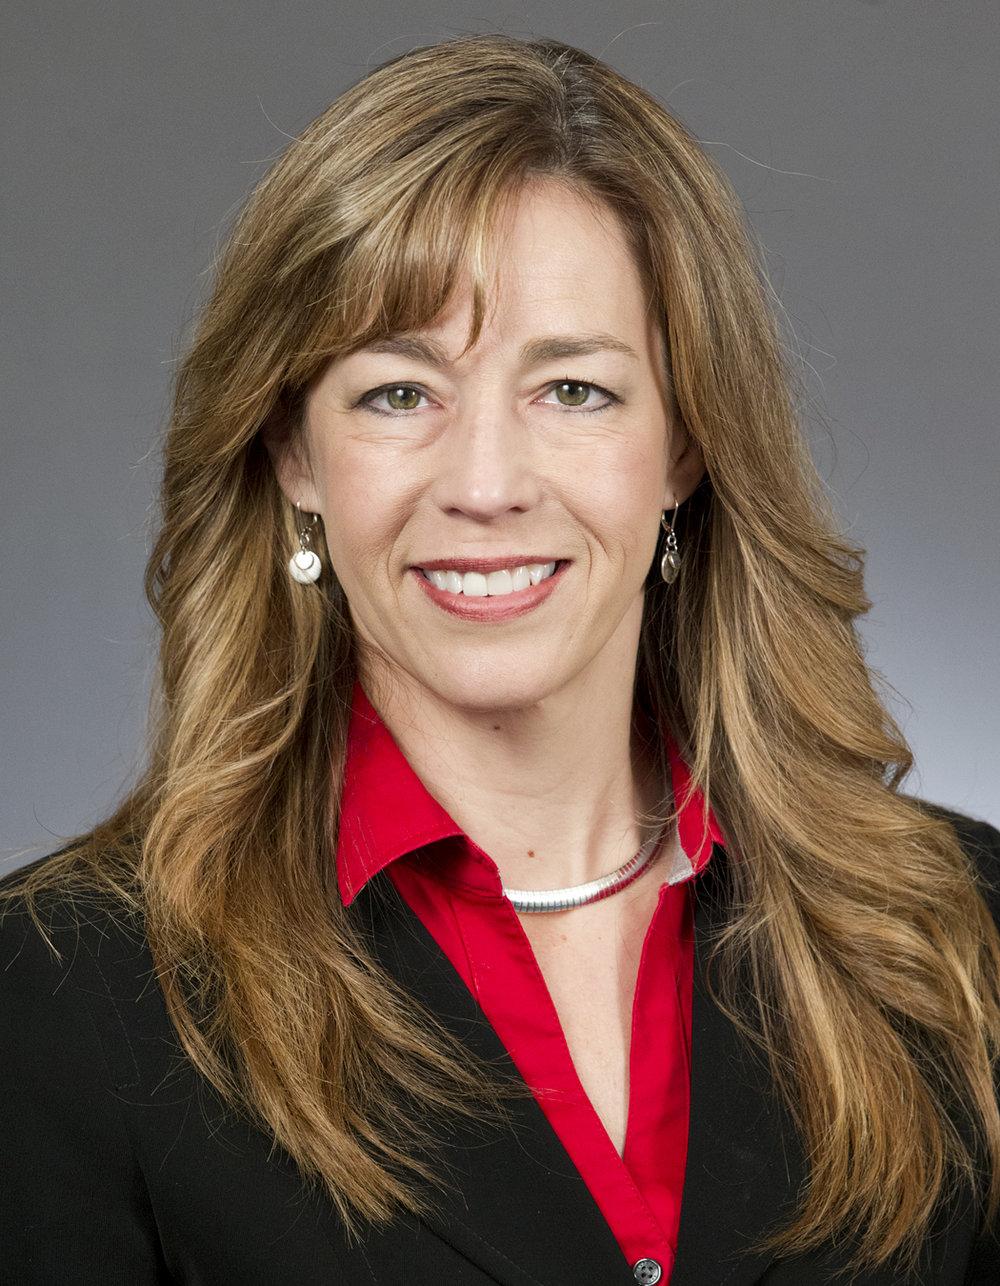 Roz Peterson